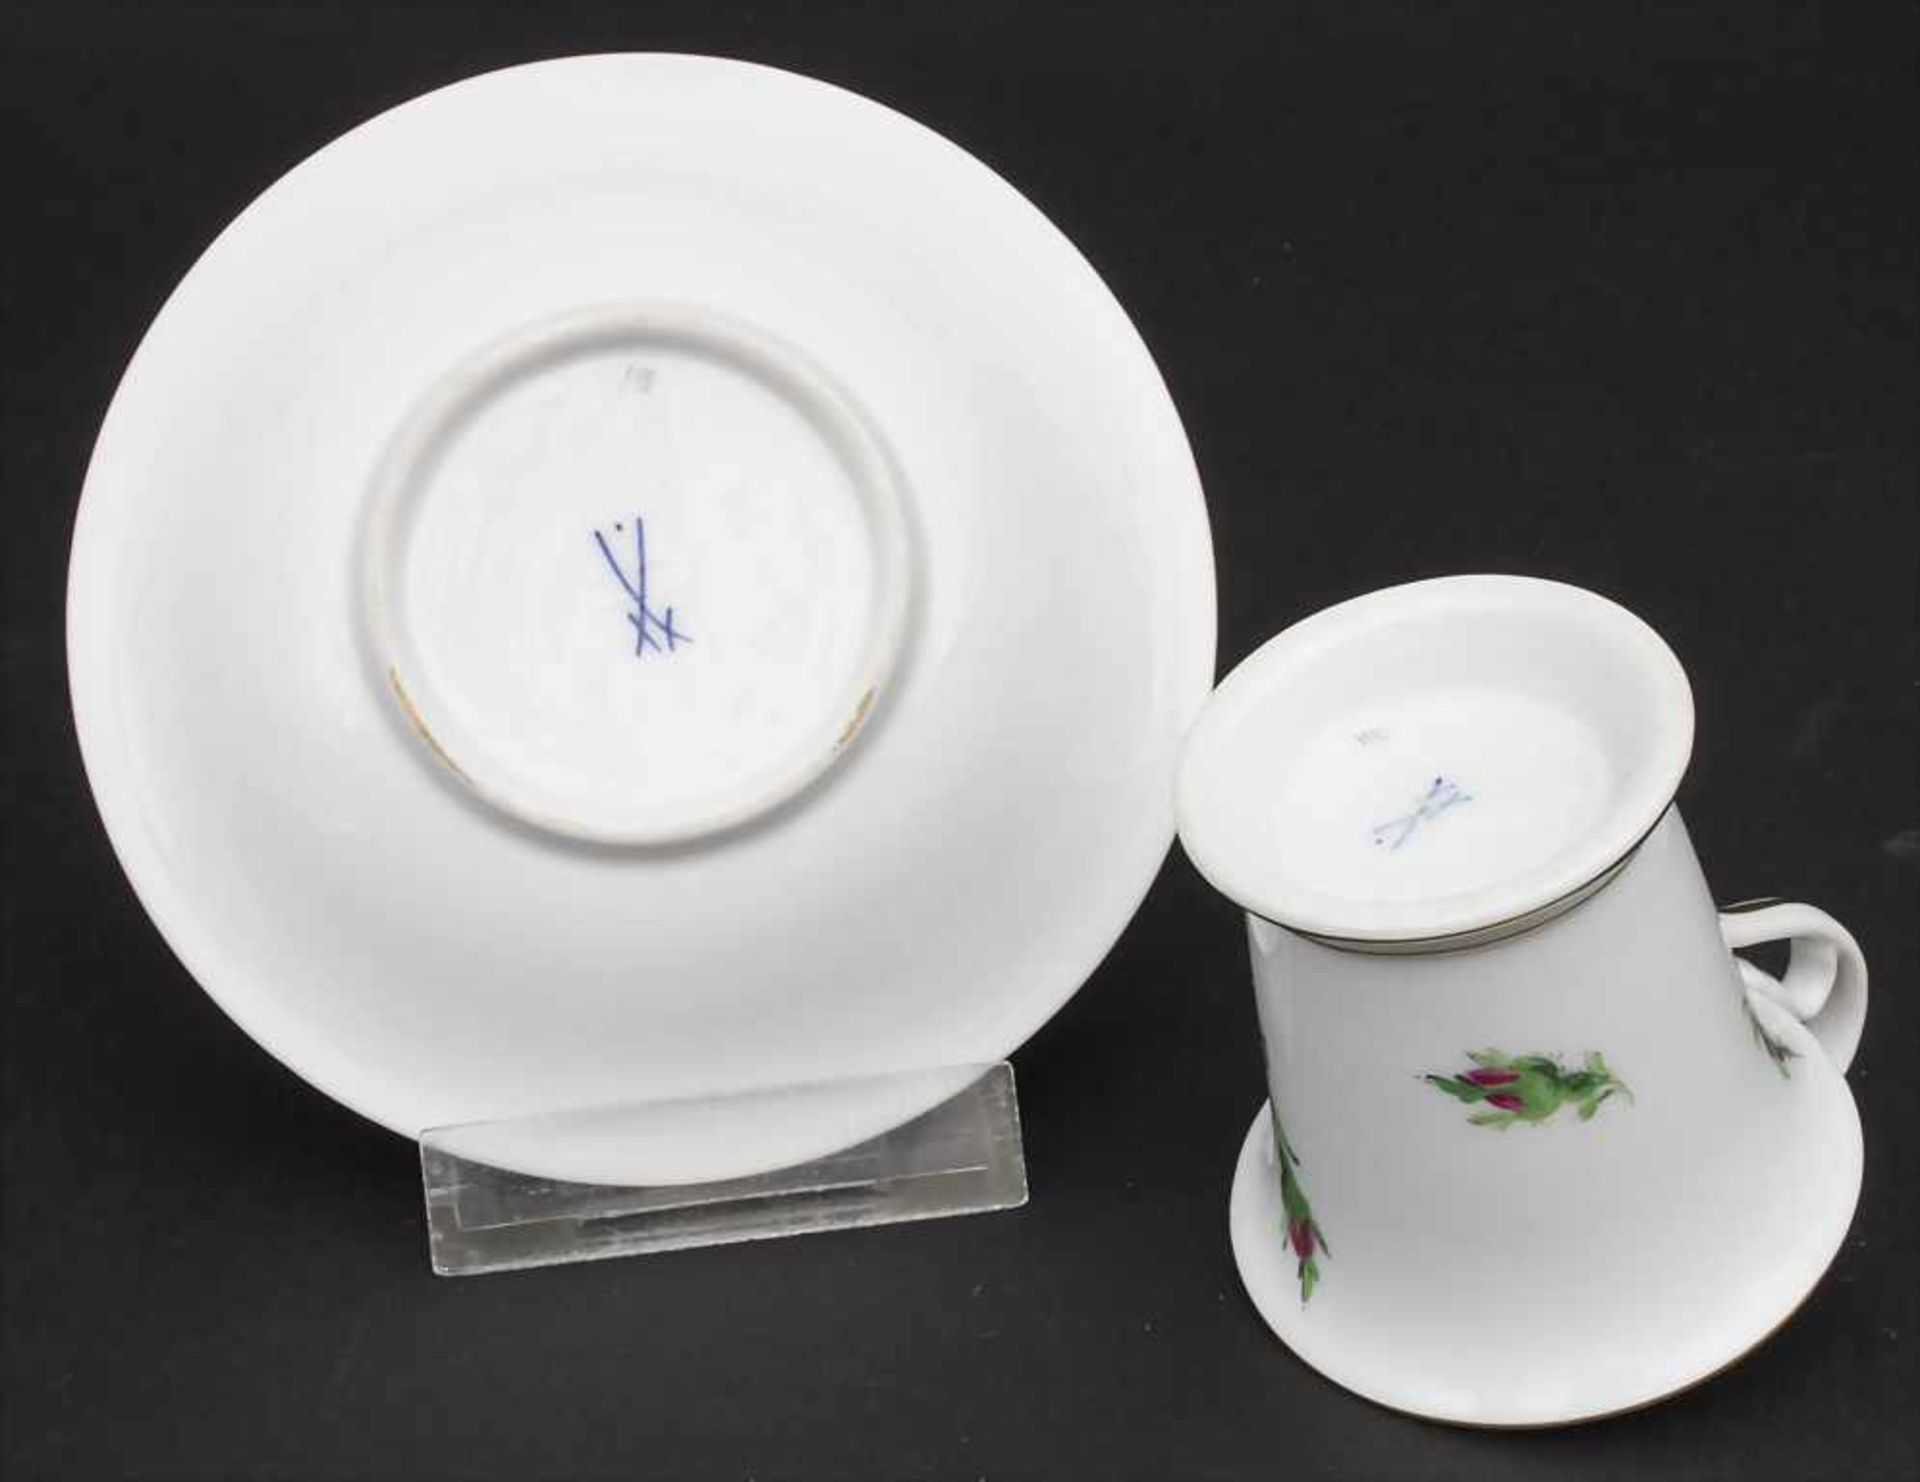 Konvolut Porzellane mit Rosendekor / A set of porcelain with roses, Meissen, 20. Jh. - Bild 9 aus 13